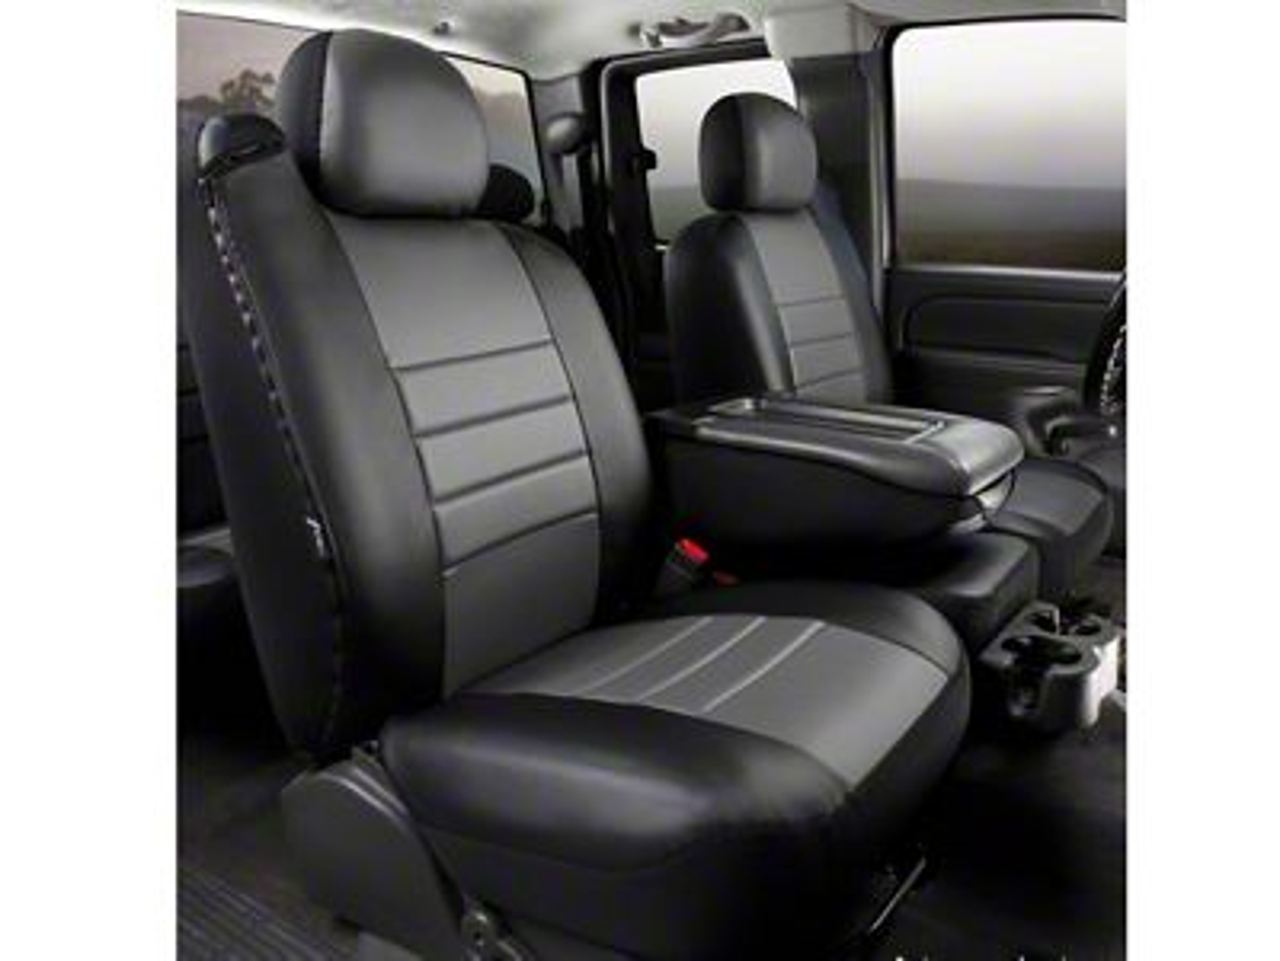 Fia F 150 Custom Fit Leatherlite Front 40 20 40 Seat Cover